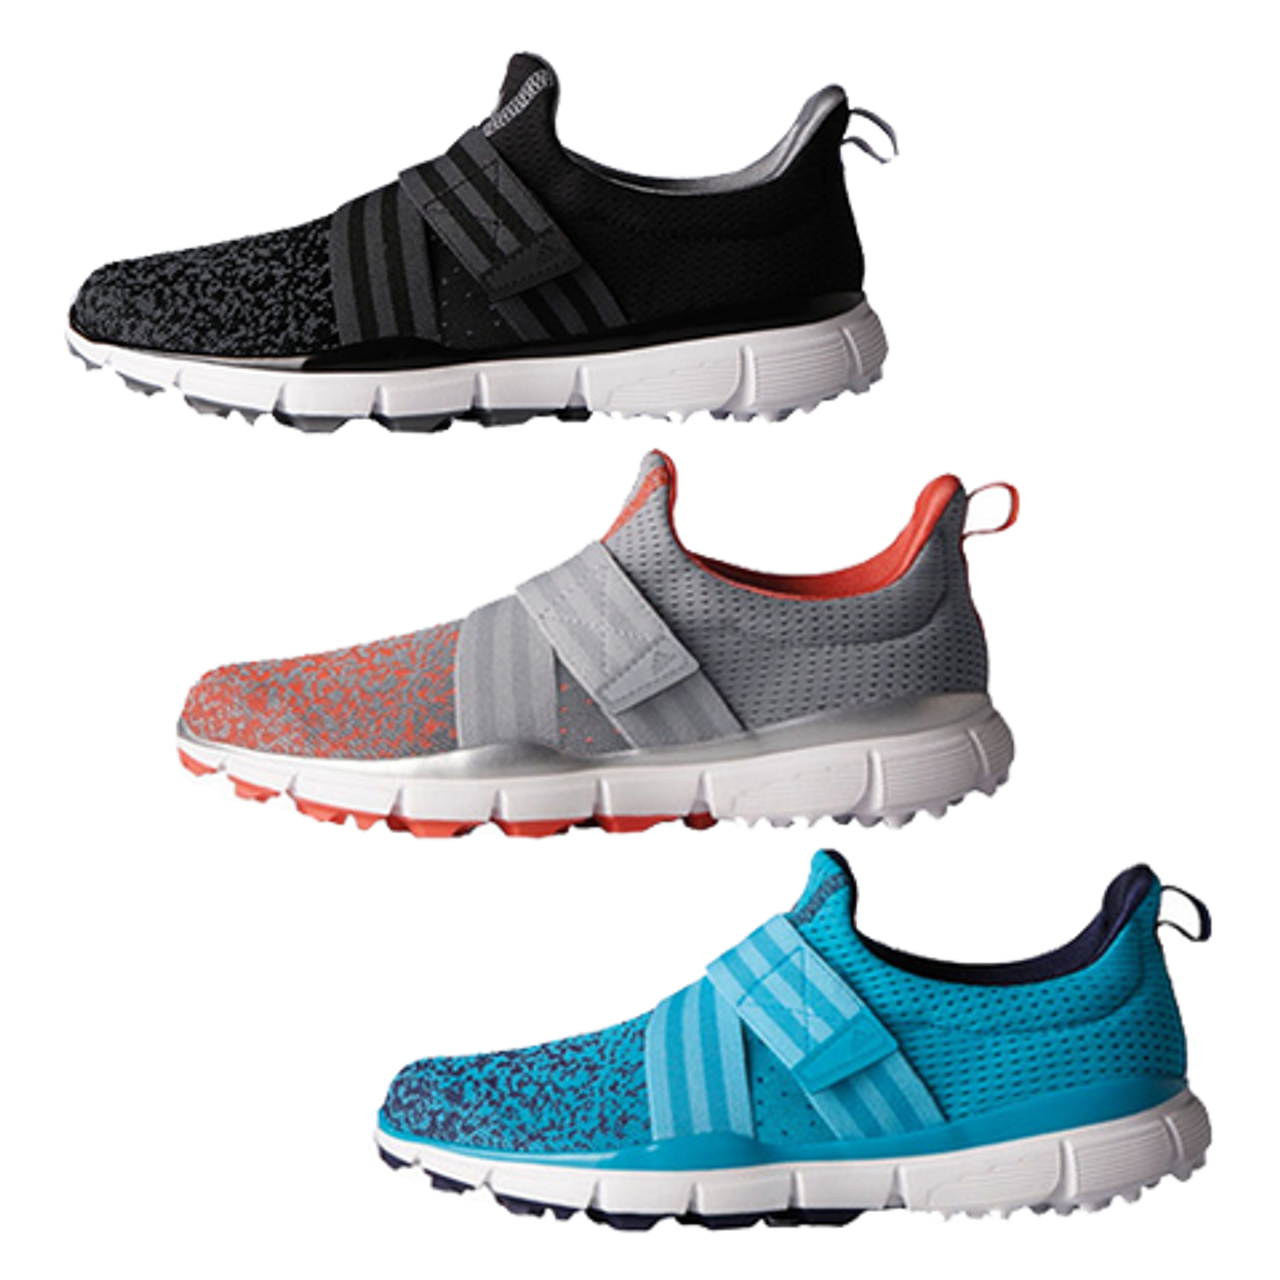 Adidas Climacool Knit Spikeless Golf Shoes 2017 Women